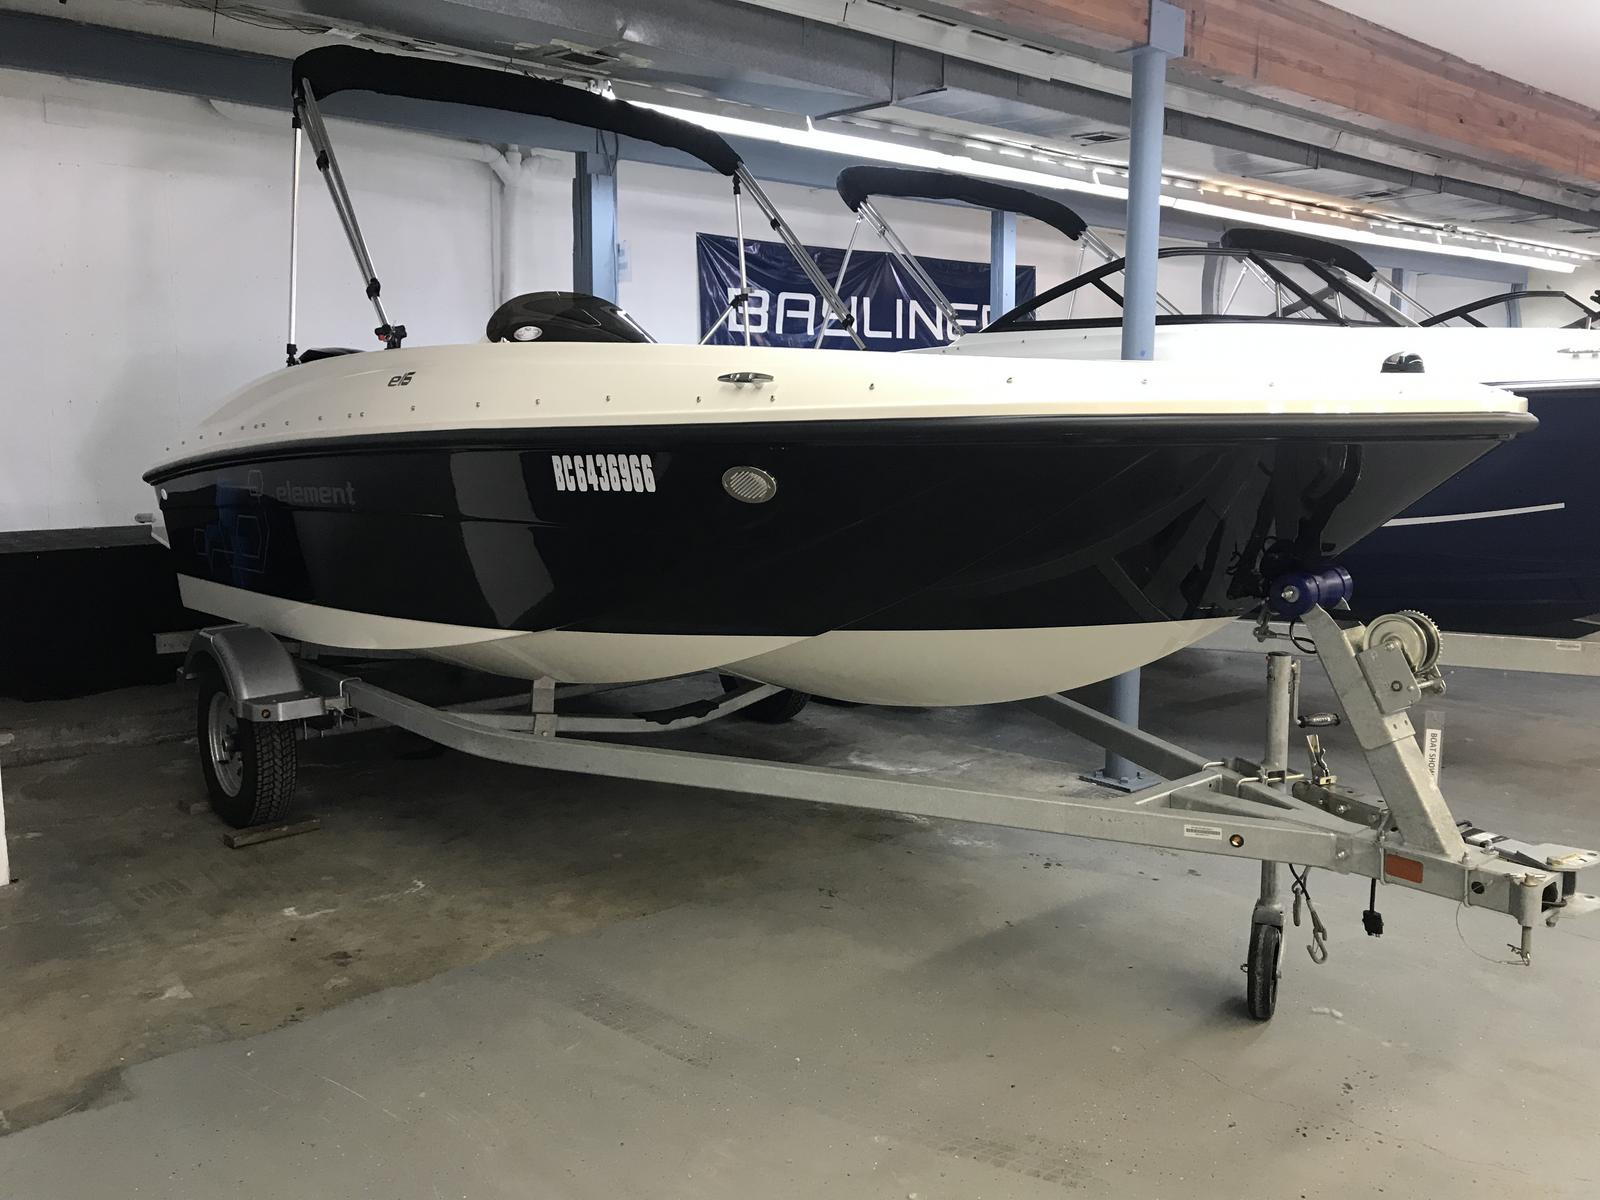 2019 Bayliner boat for sale, model of the boat is Element E16 & Image # 1 of 16